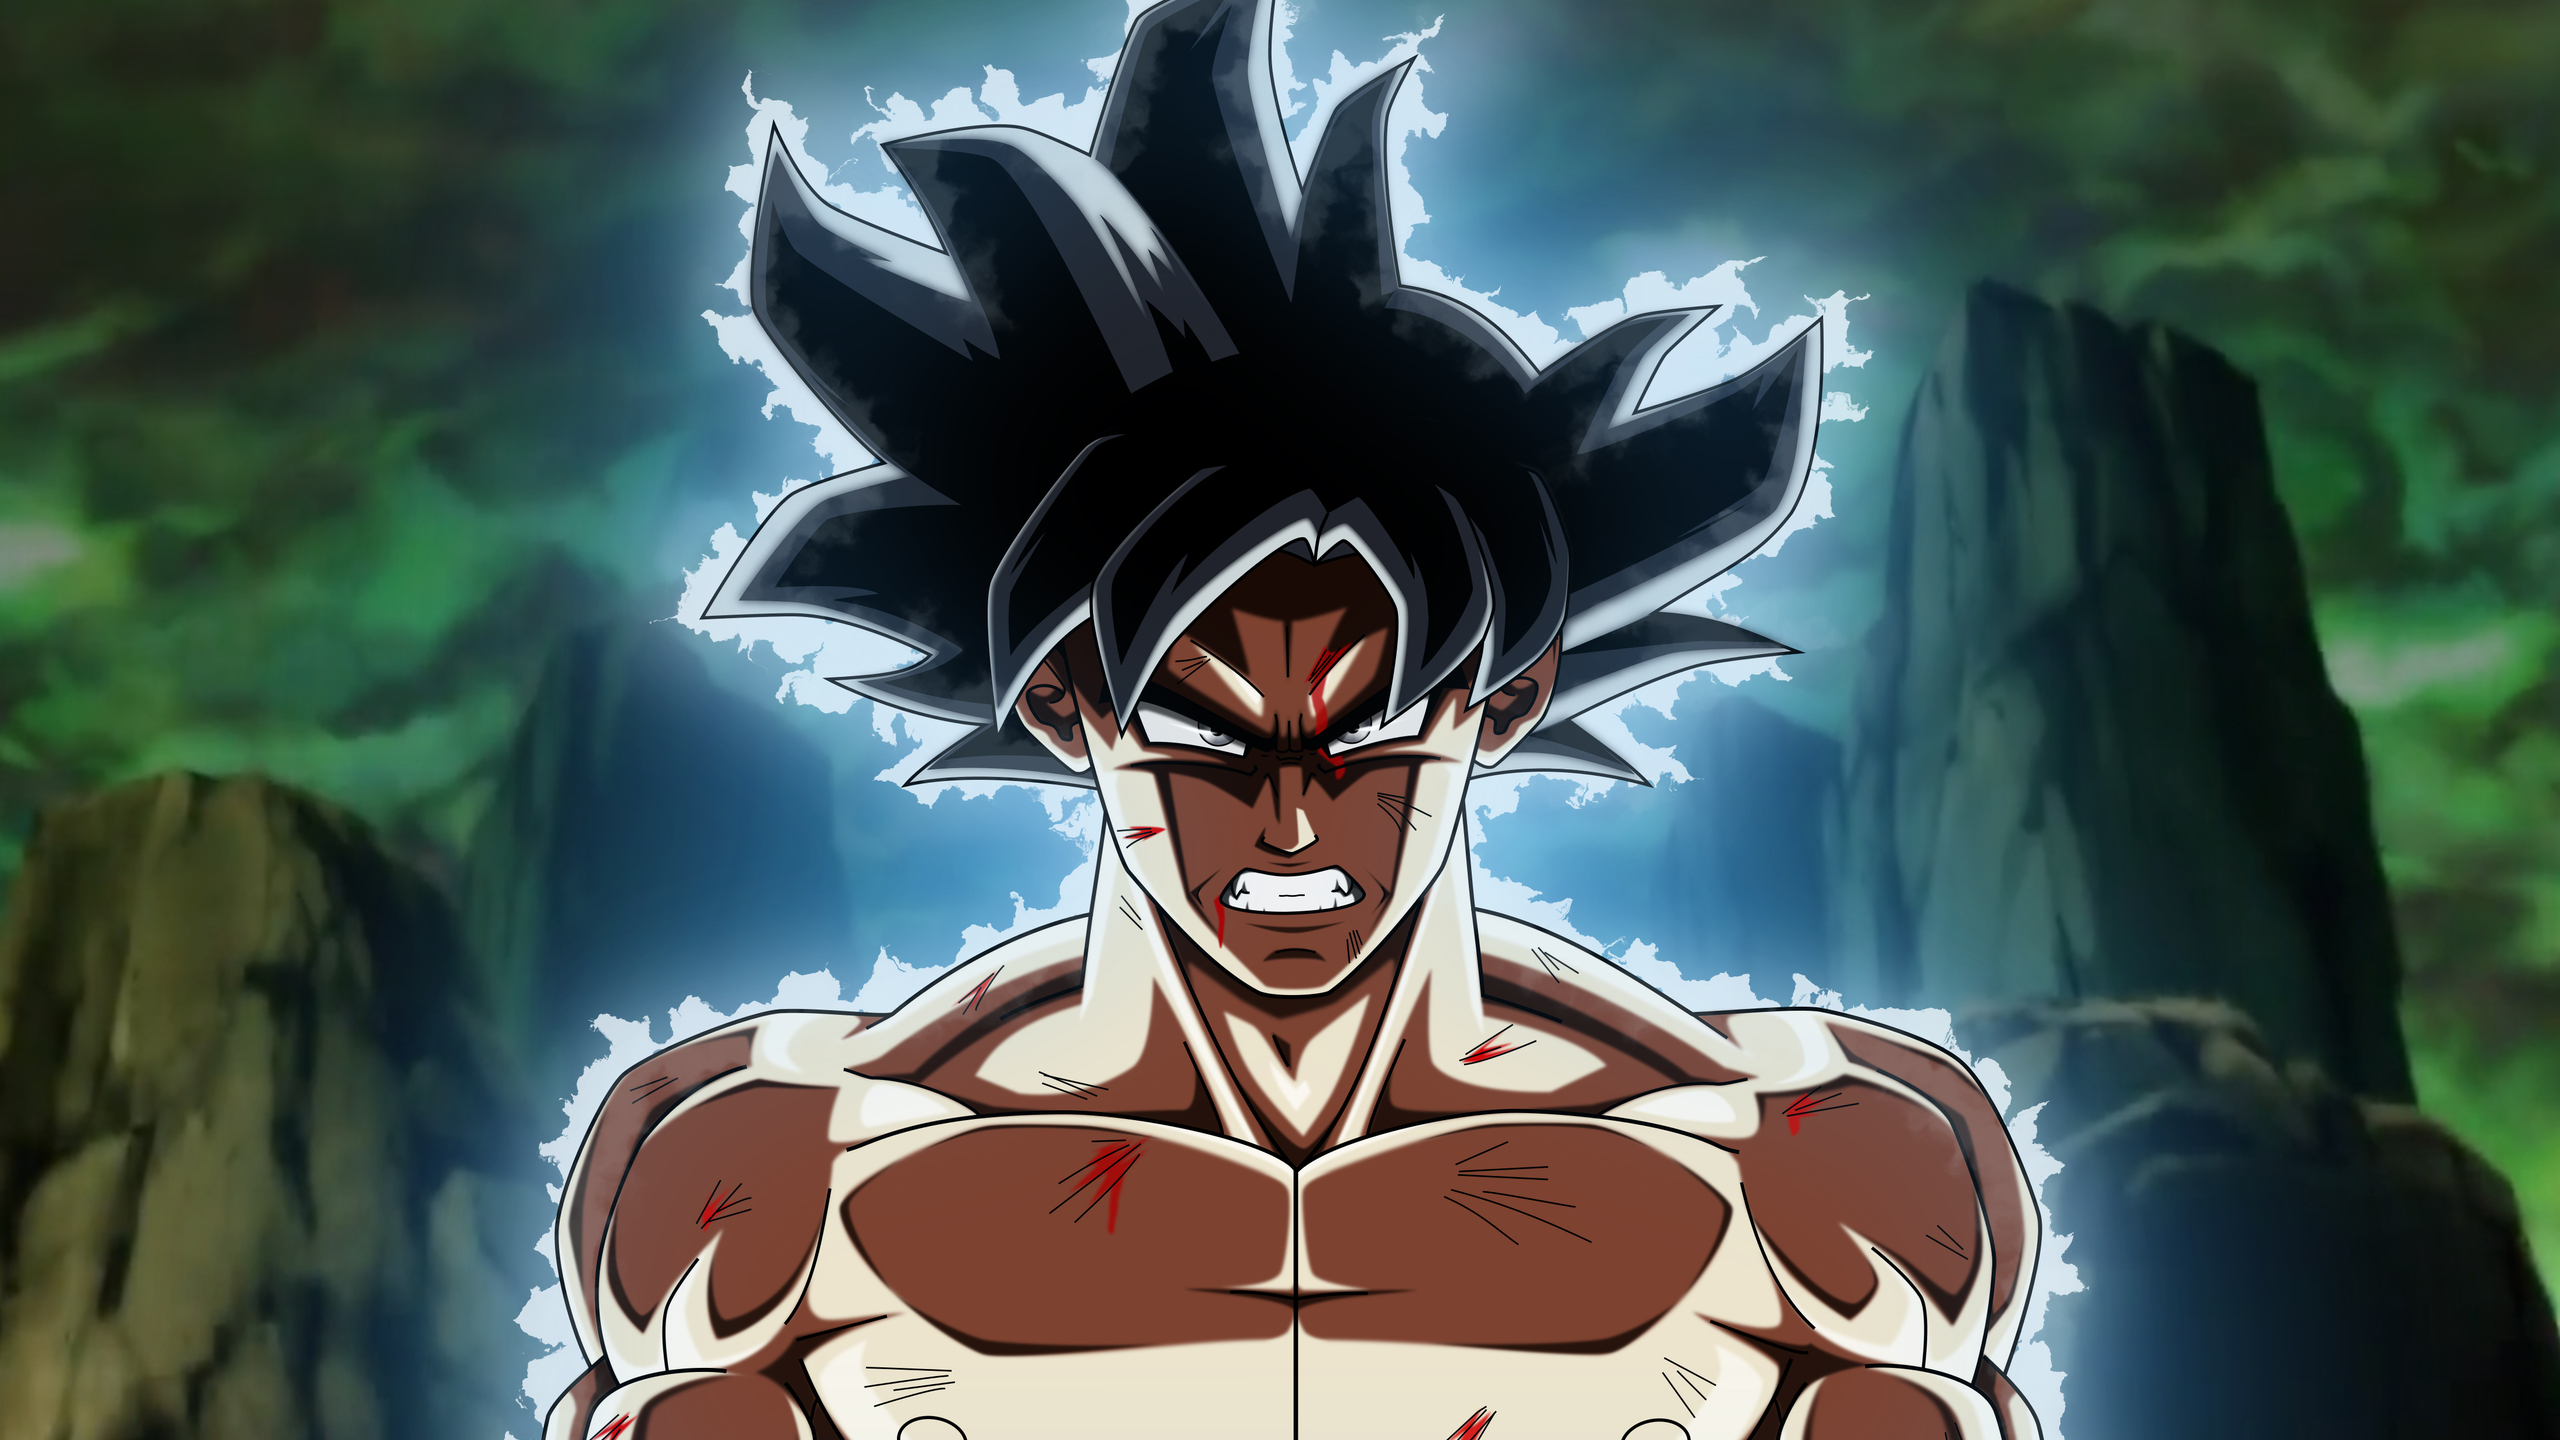 2560x1440 Dragon Ball Super Goku Ultra Instinct 1440p Resolution